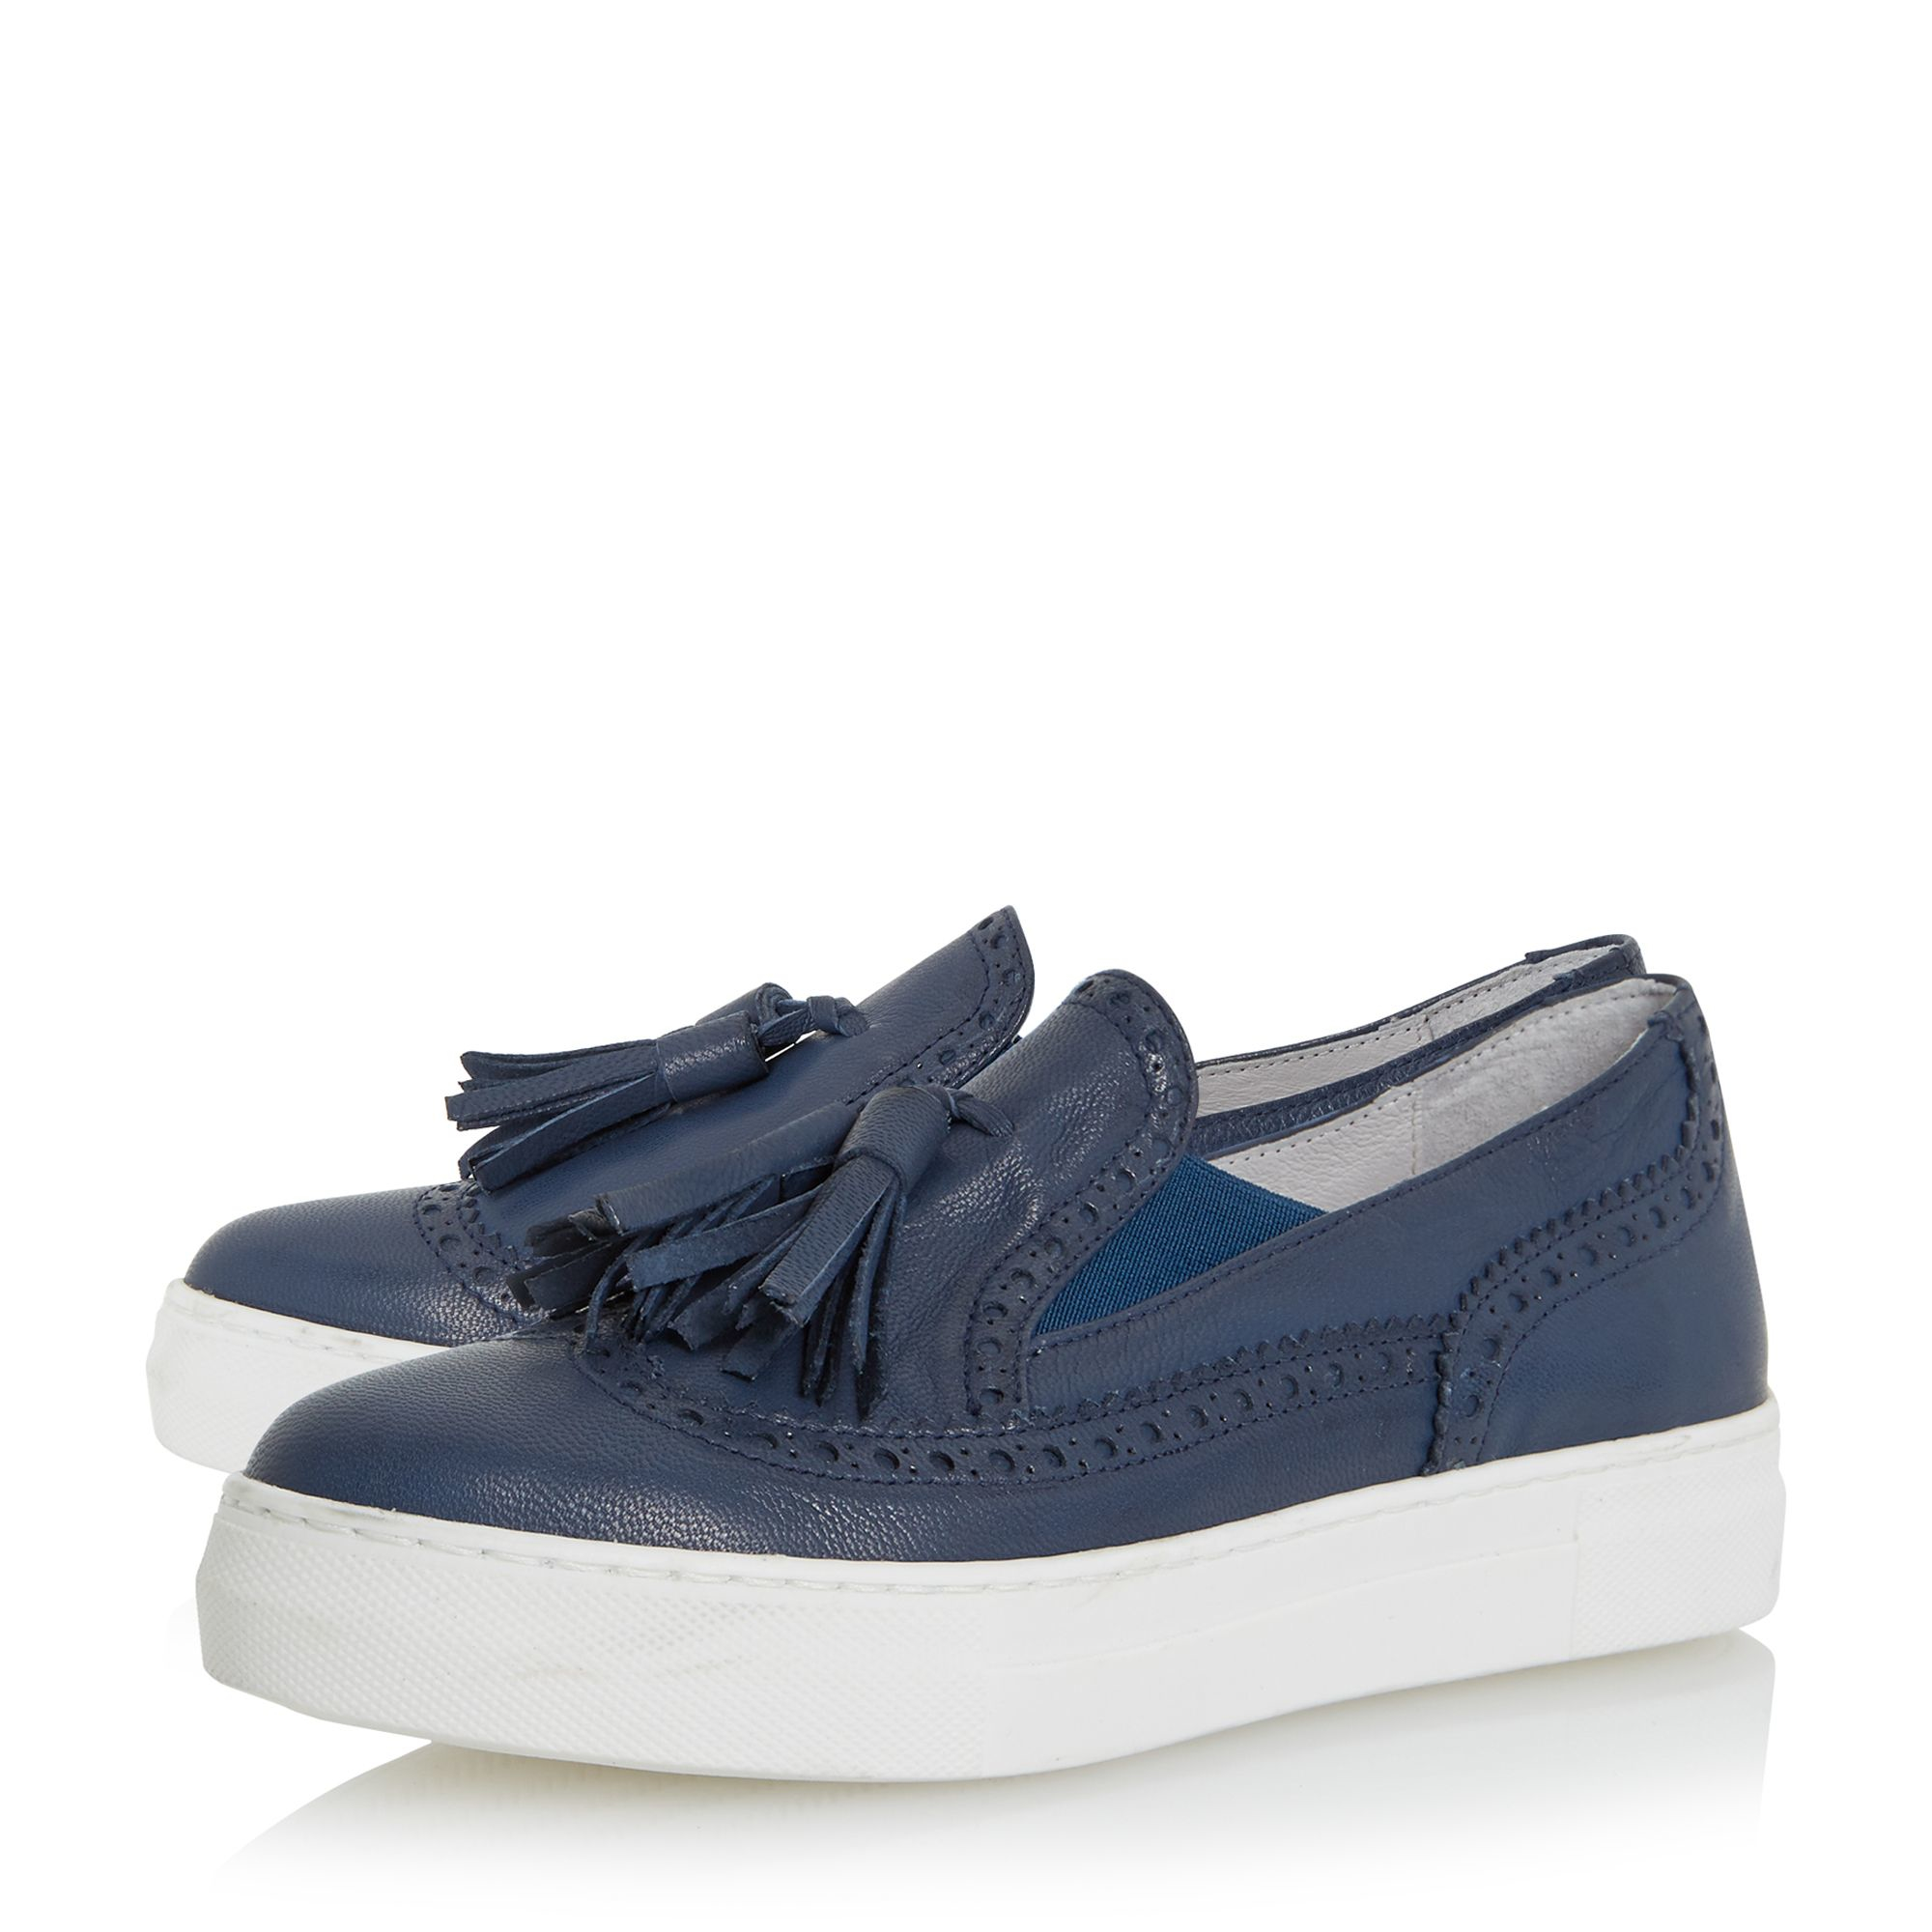 Black White Sole Wingtip Shoes